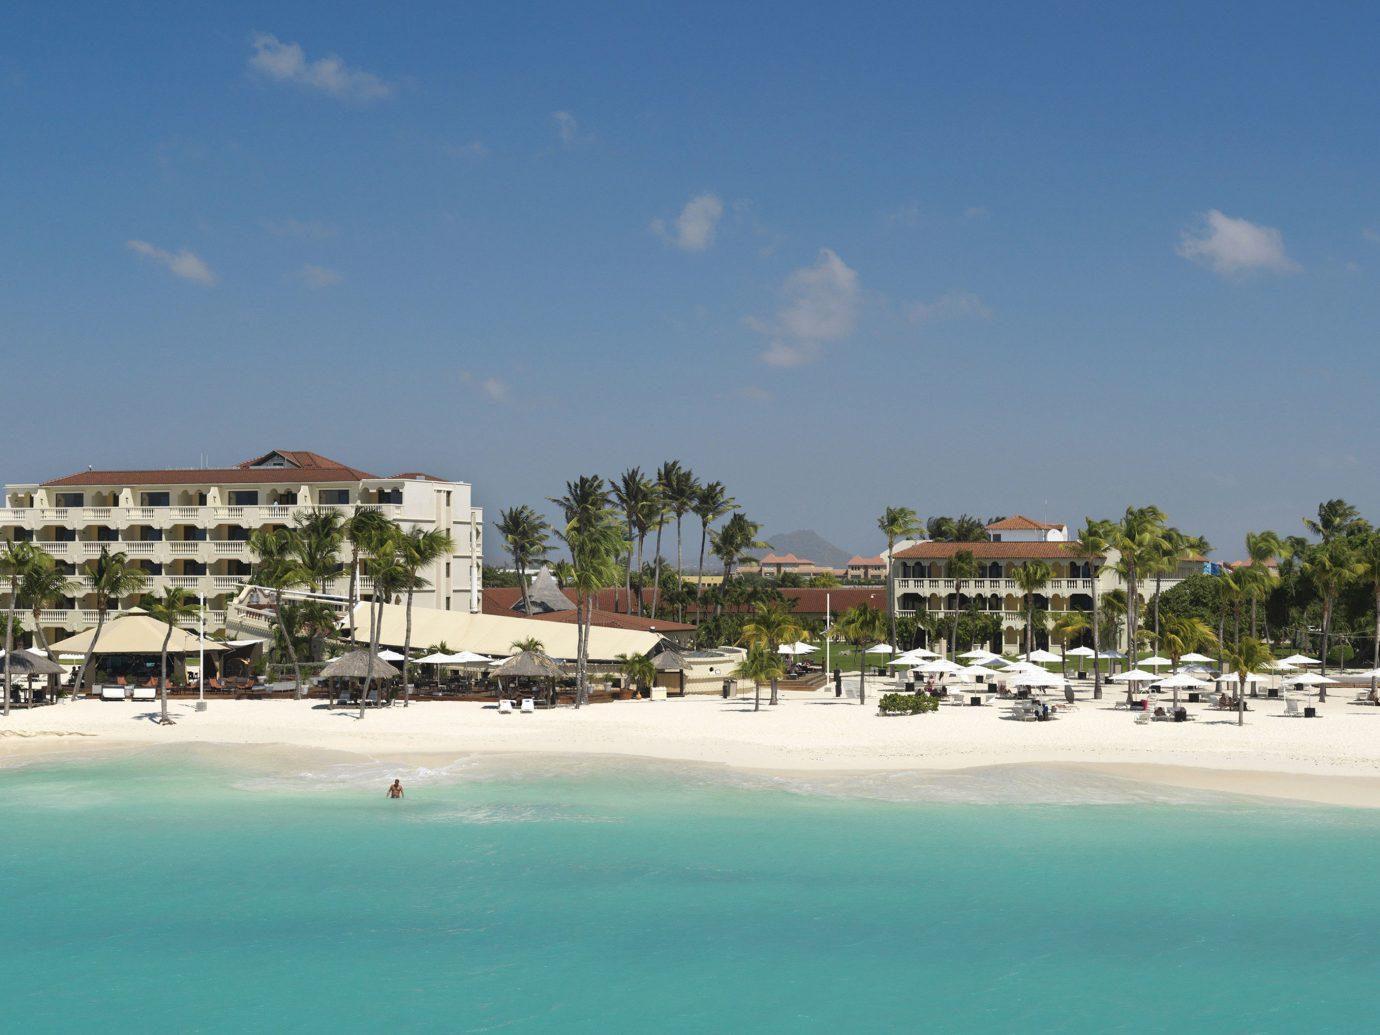 Aruba Hotels sky outdoor Beach Nature shore body of water Sea Resort vacation Ocean Coast caribbean bay Lagoon marina cape sandy